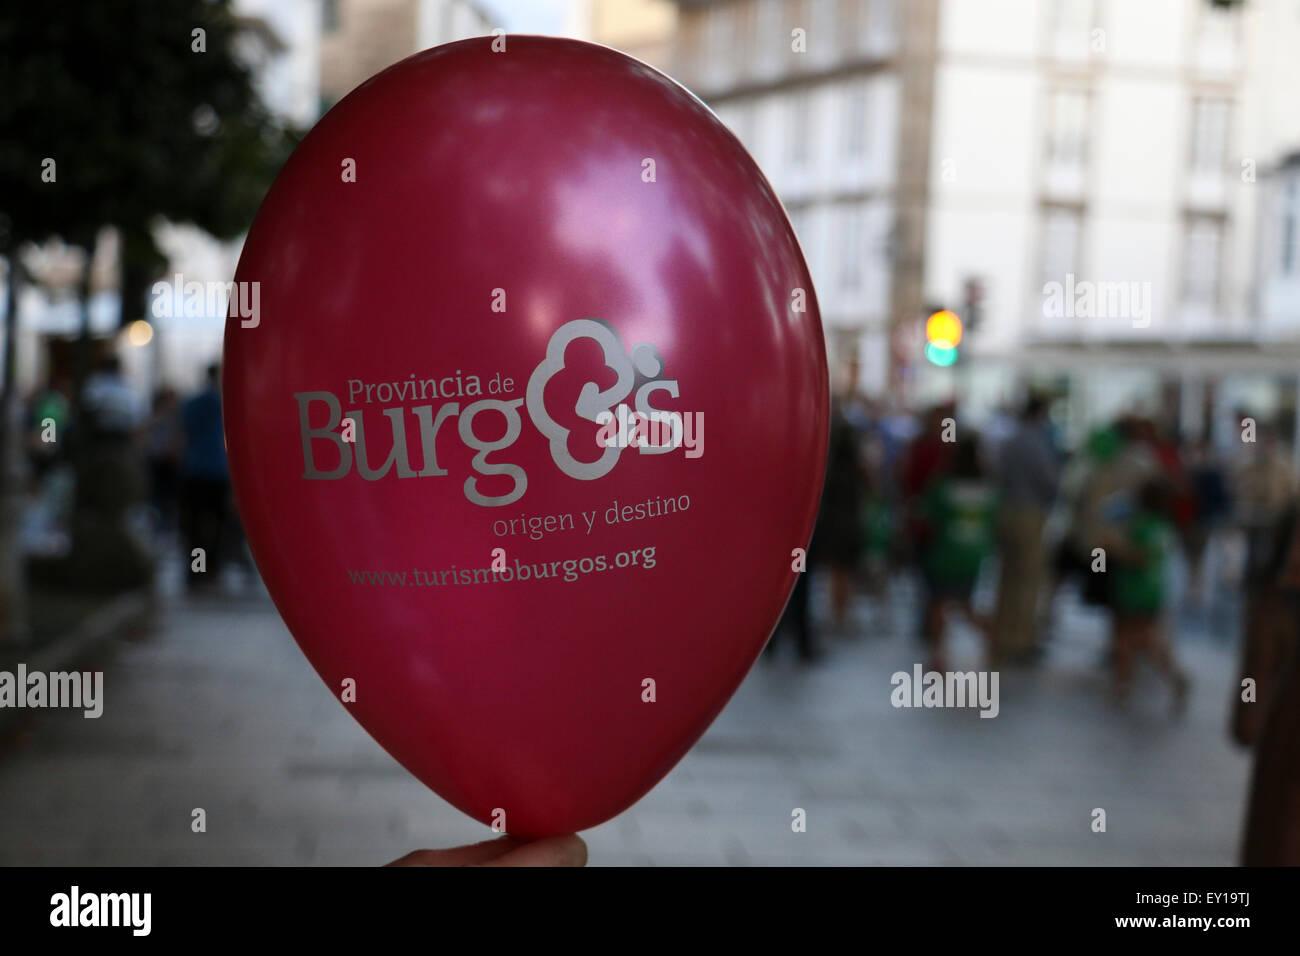 Provincia de Burgos globo Imagen De Stock